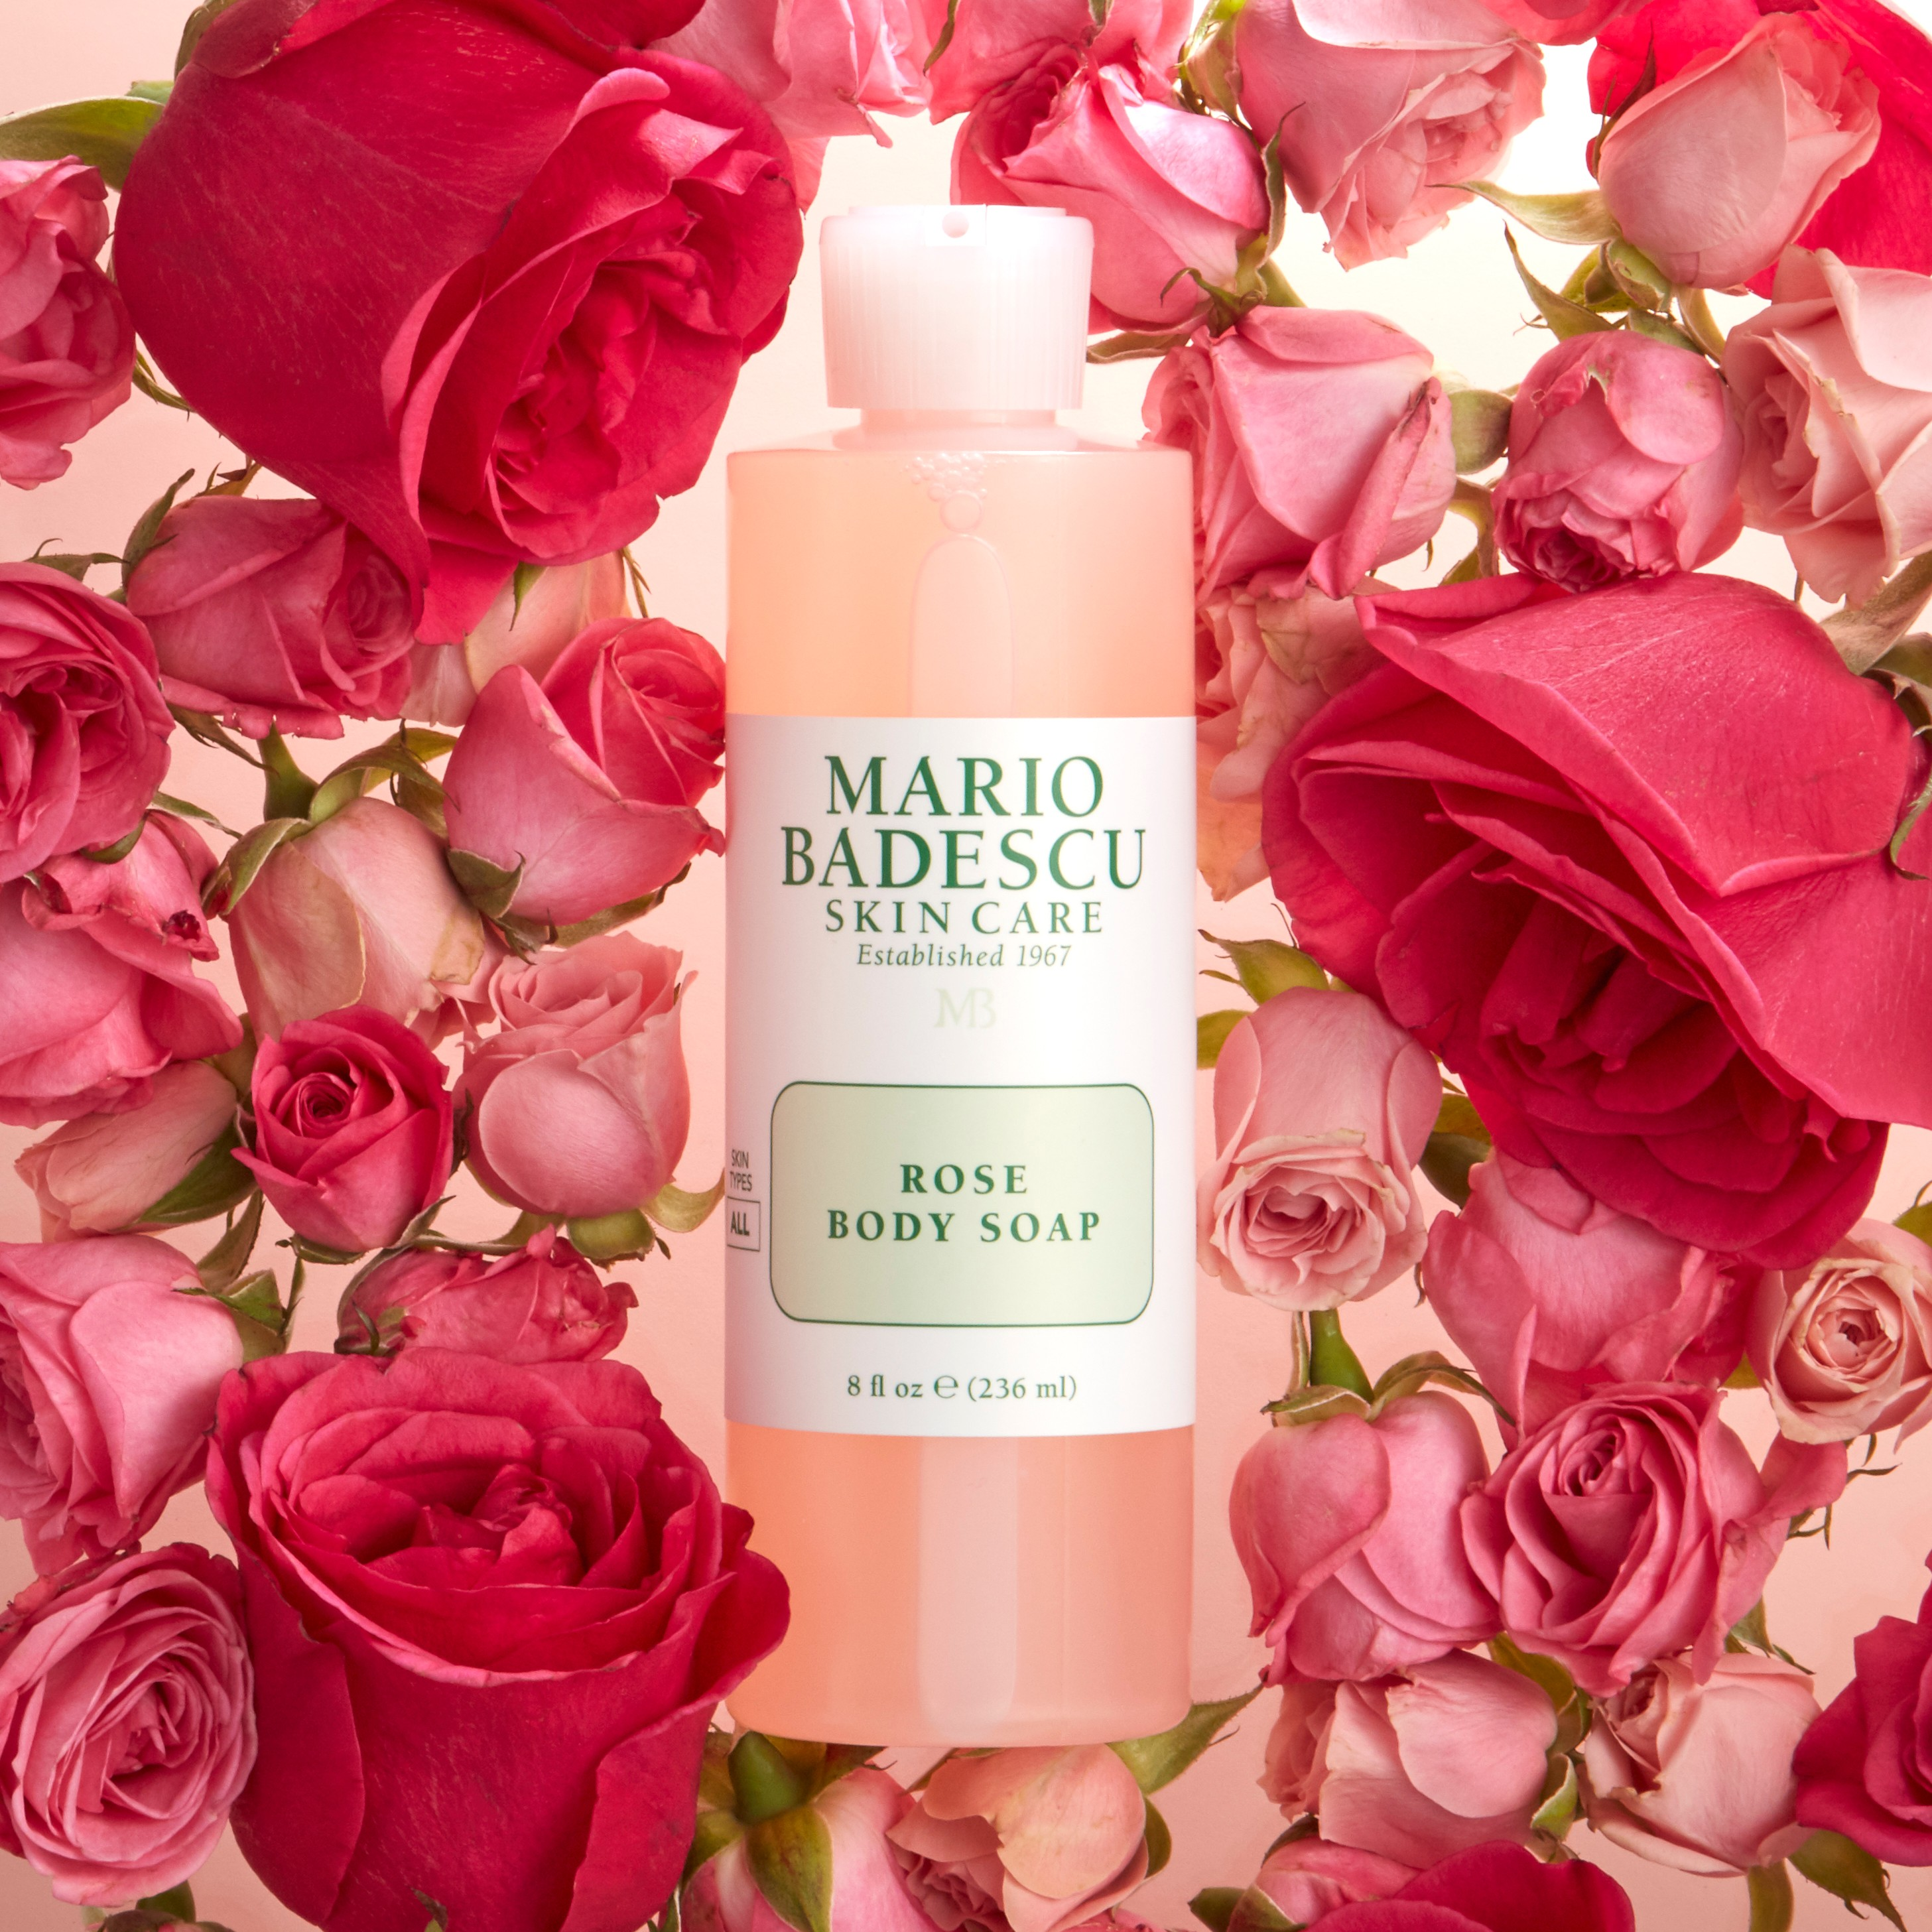 Skincare-product-mariobadescu-single-rose-body-soap-roses-0323-Web-Rendition